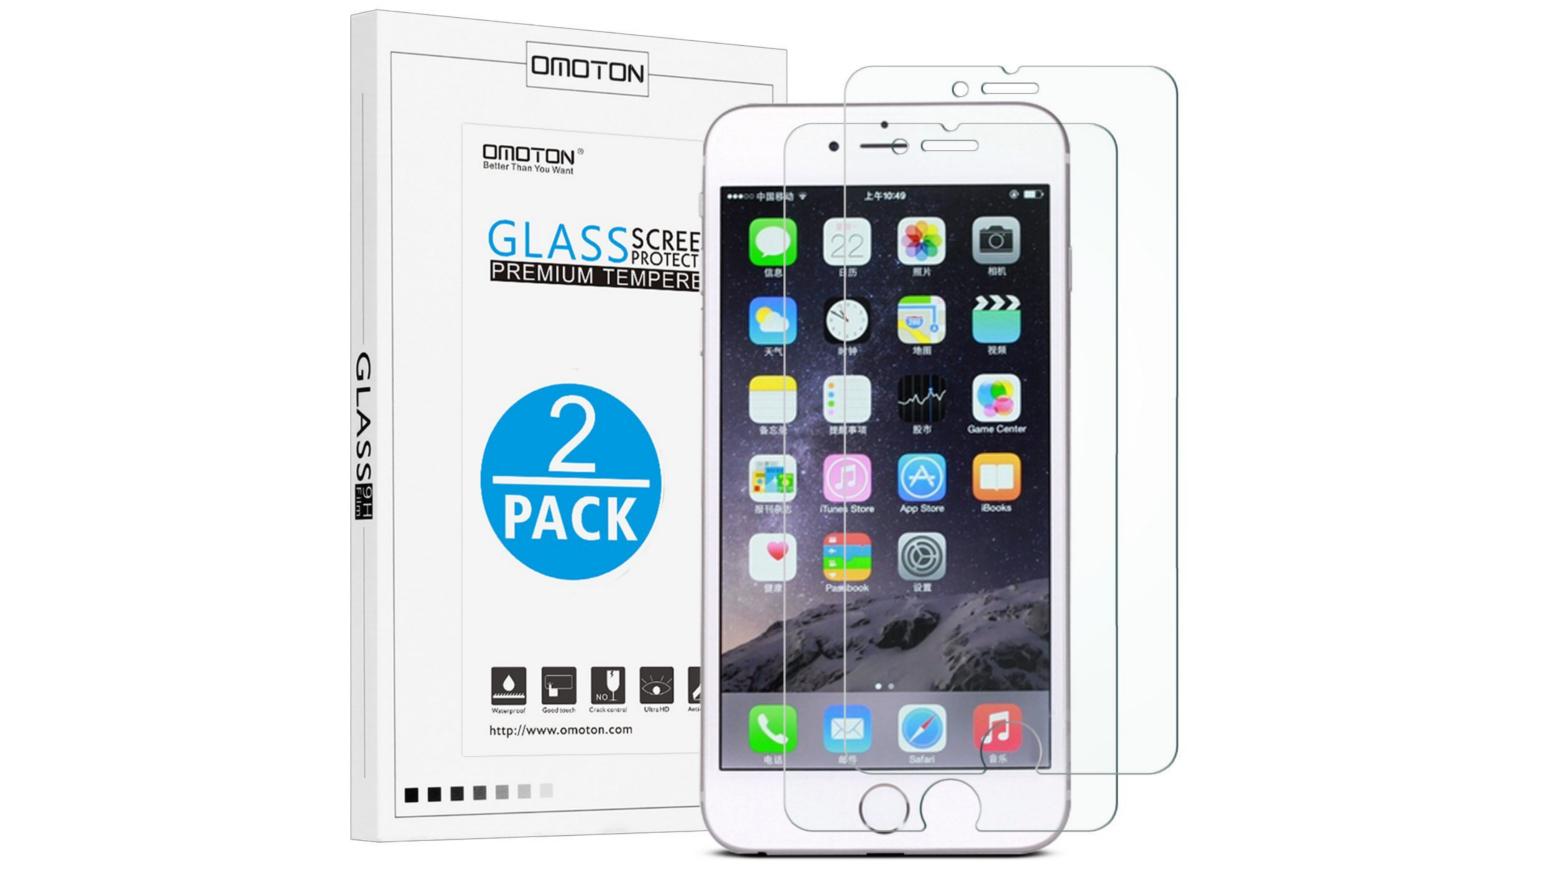 iphone 7, iphone 7, iphone 7 release, iphone 7 plus accessories, best iphone 7 accessories, iphone 7 plus charger, iphone 7 plus headphones, iphone 7 plus pencil